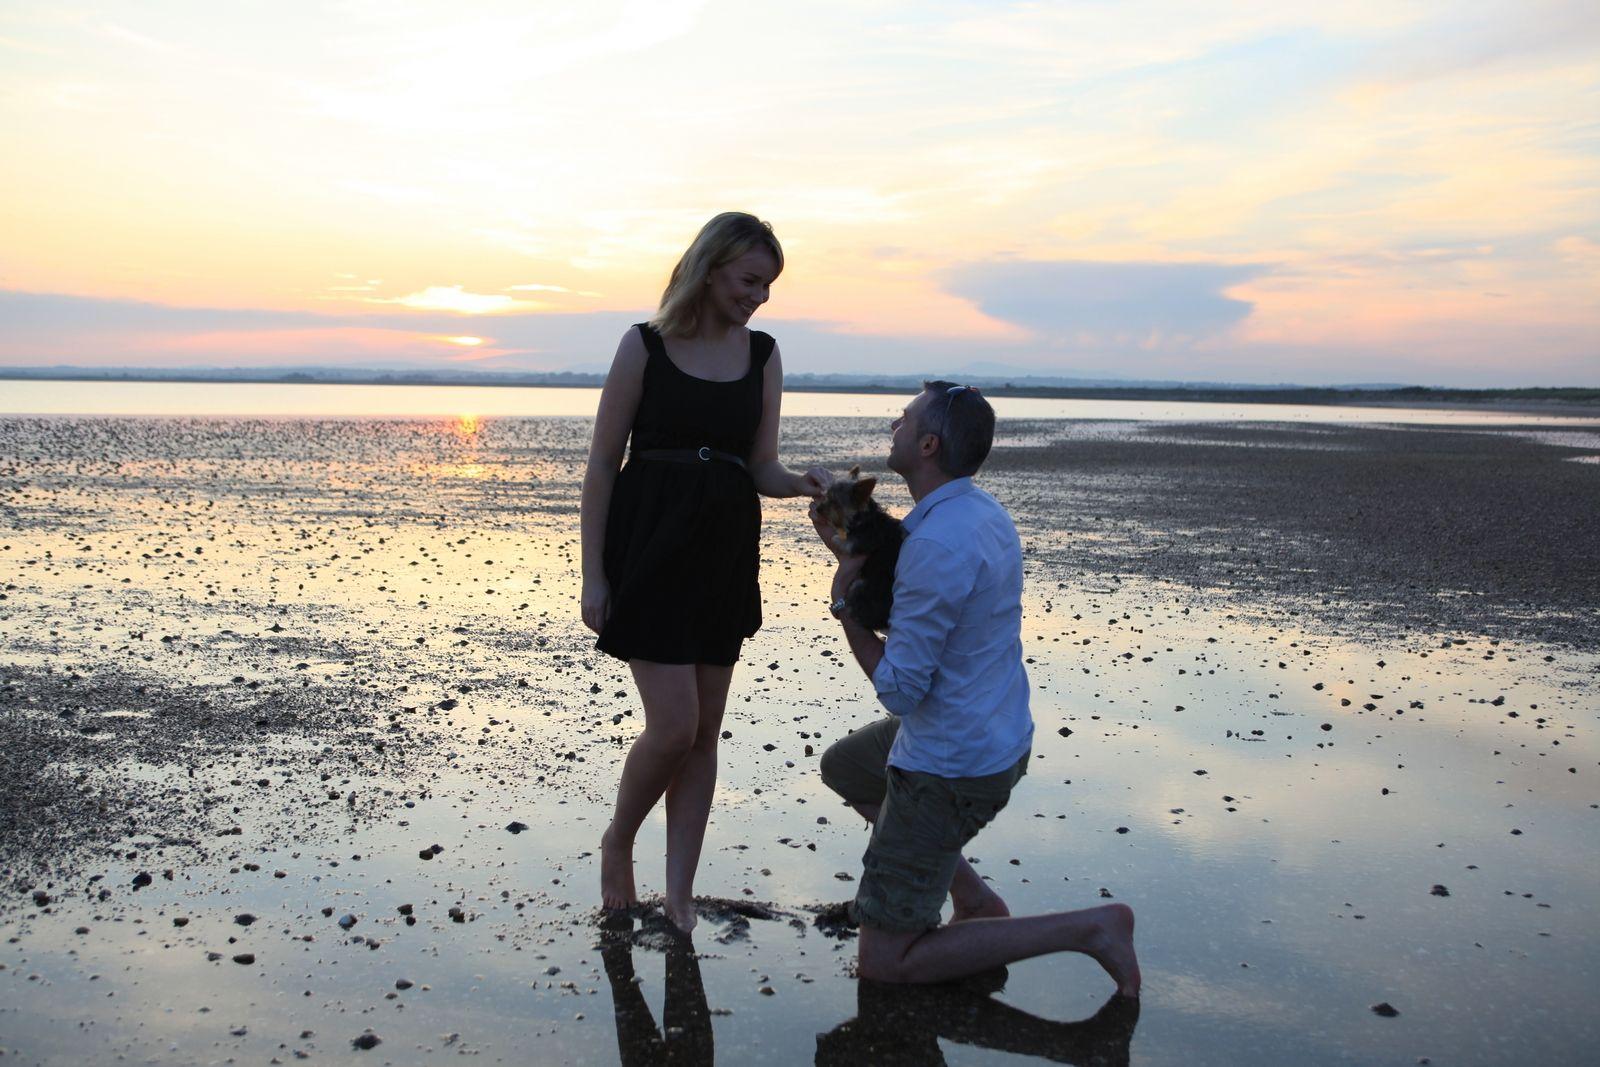 The Raven Point, Wexford, Ireland. Engagement photo. Photo contest. Please vote.